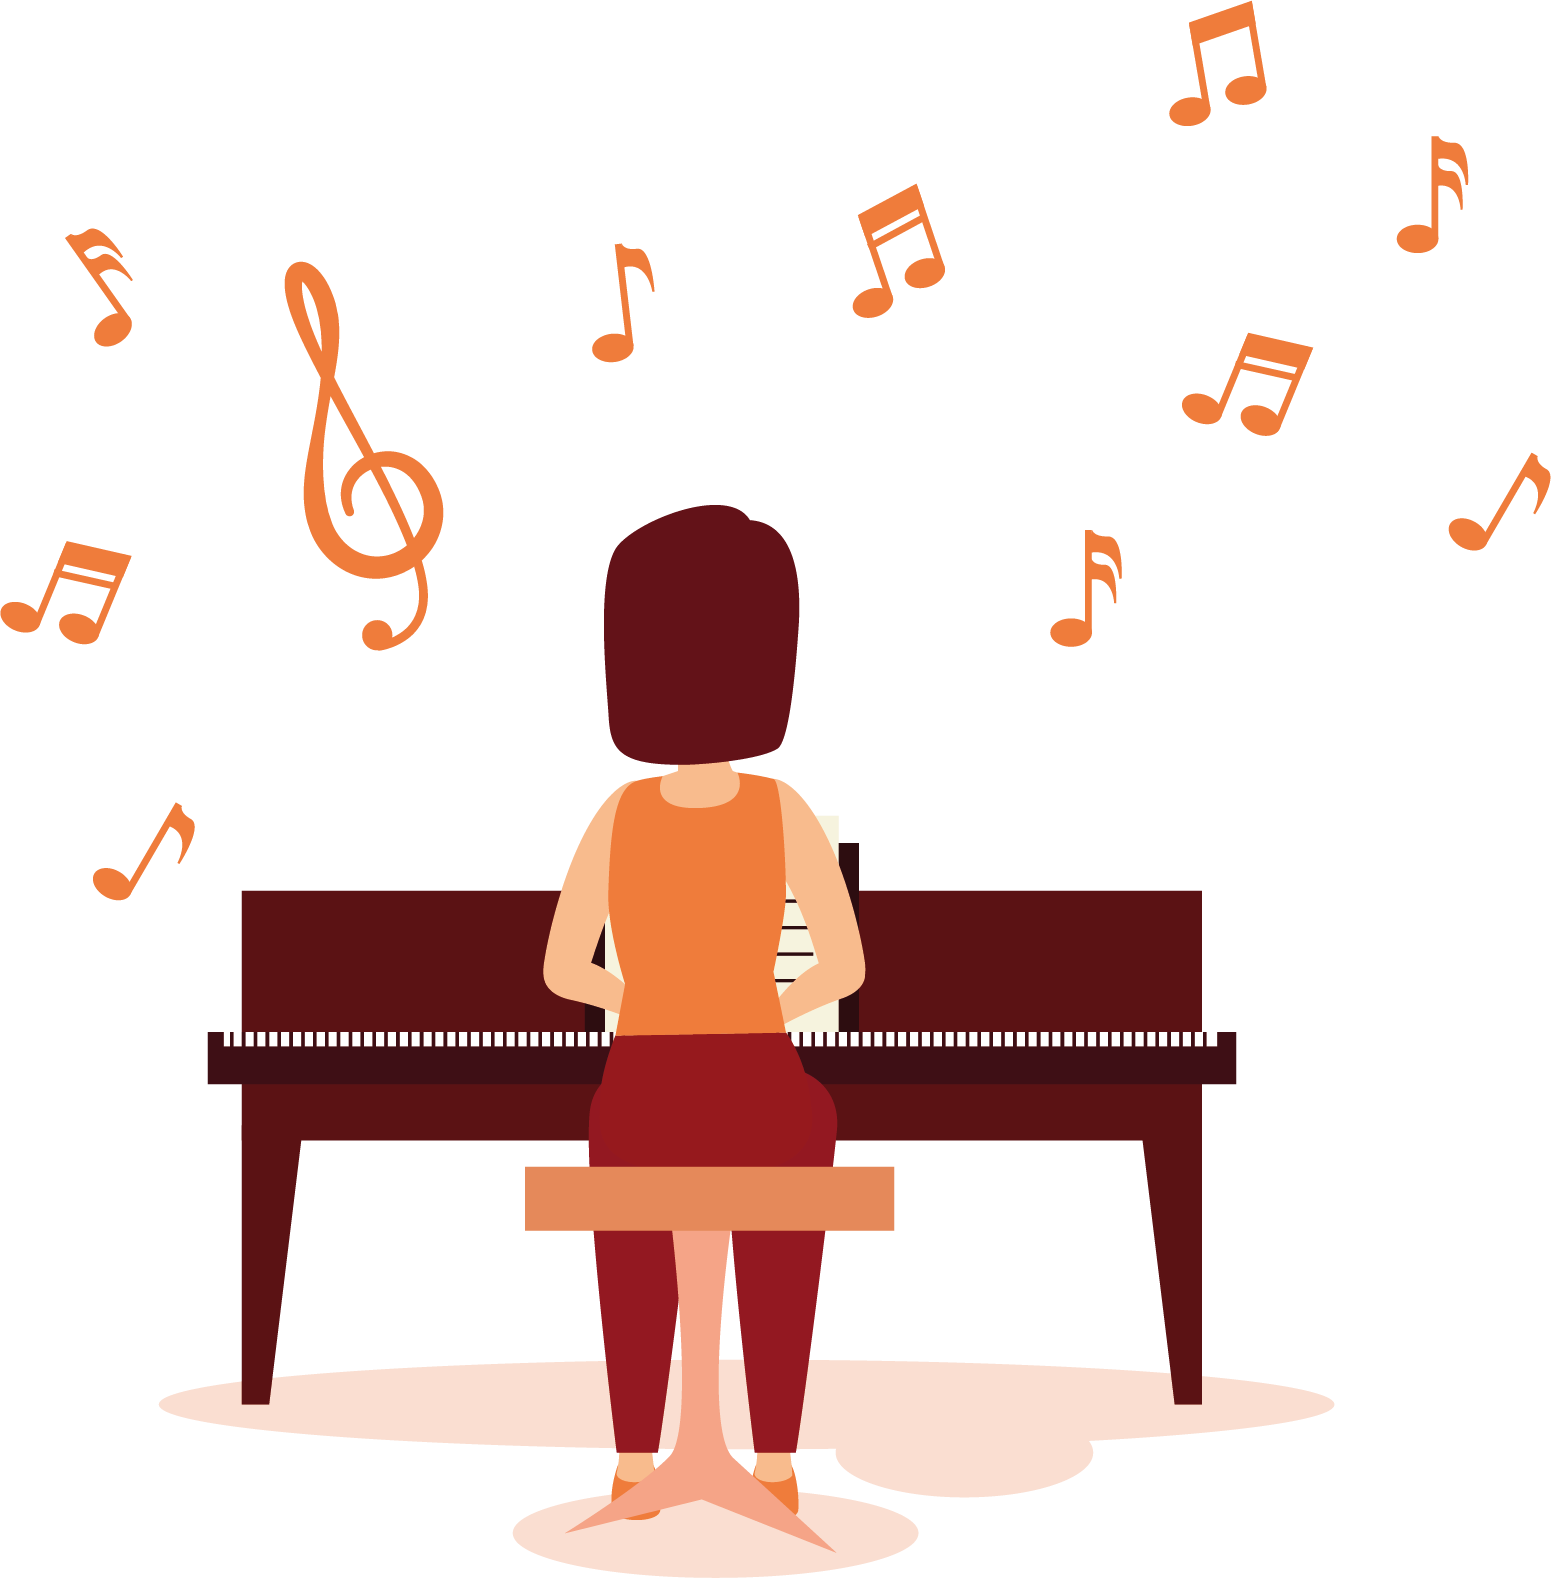 Piano tocar